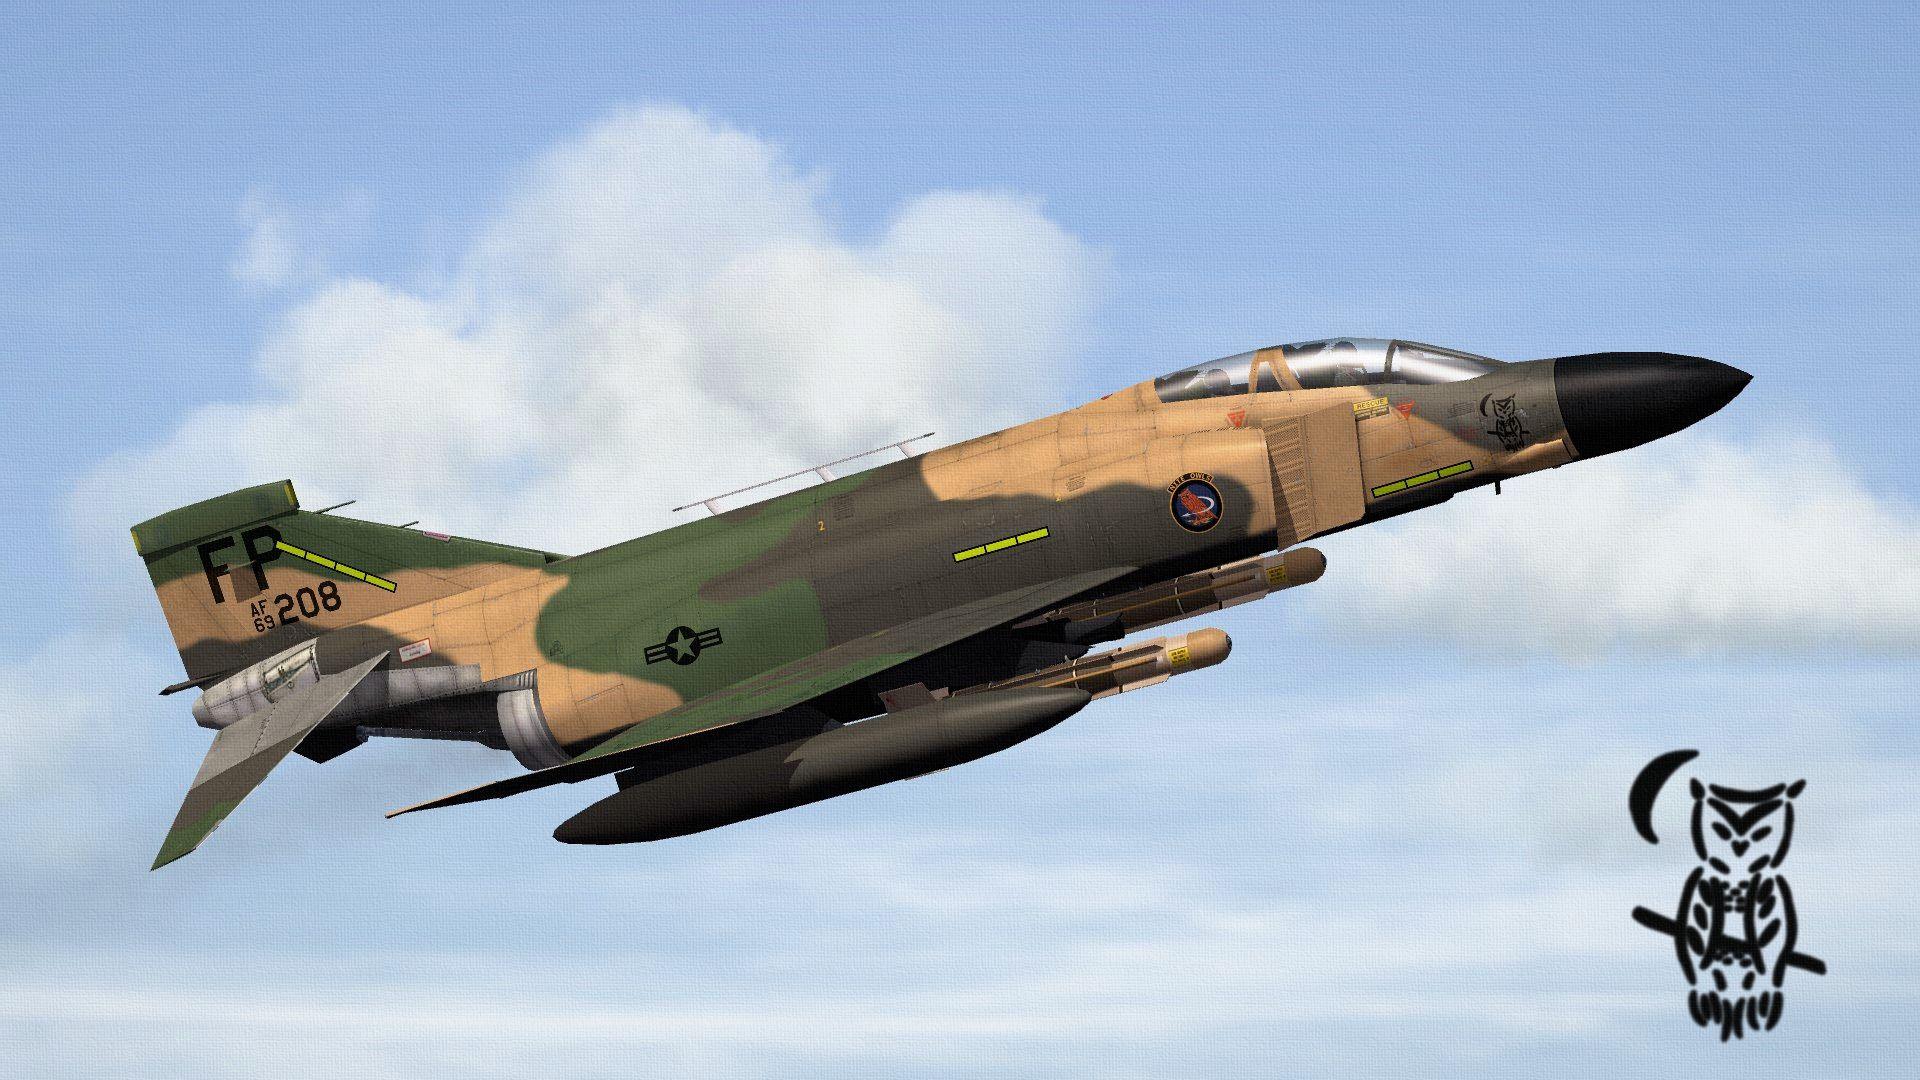 USAFF-4MPHANTOM23_zps4a9c4e6b.jpg